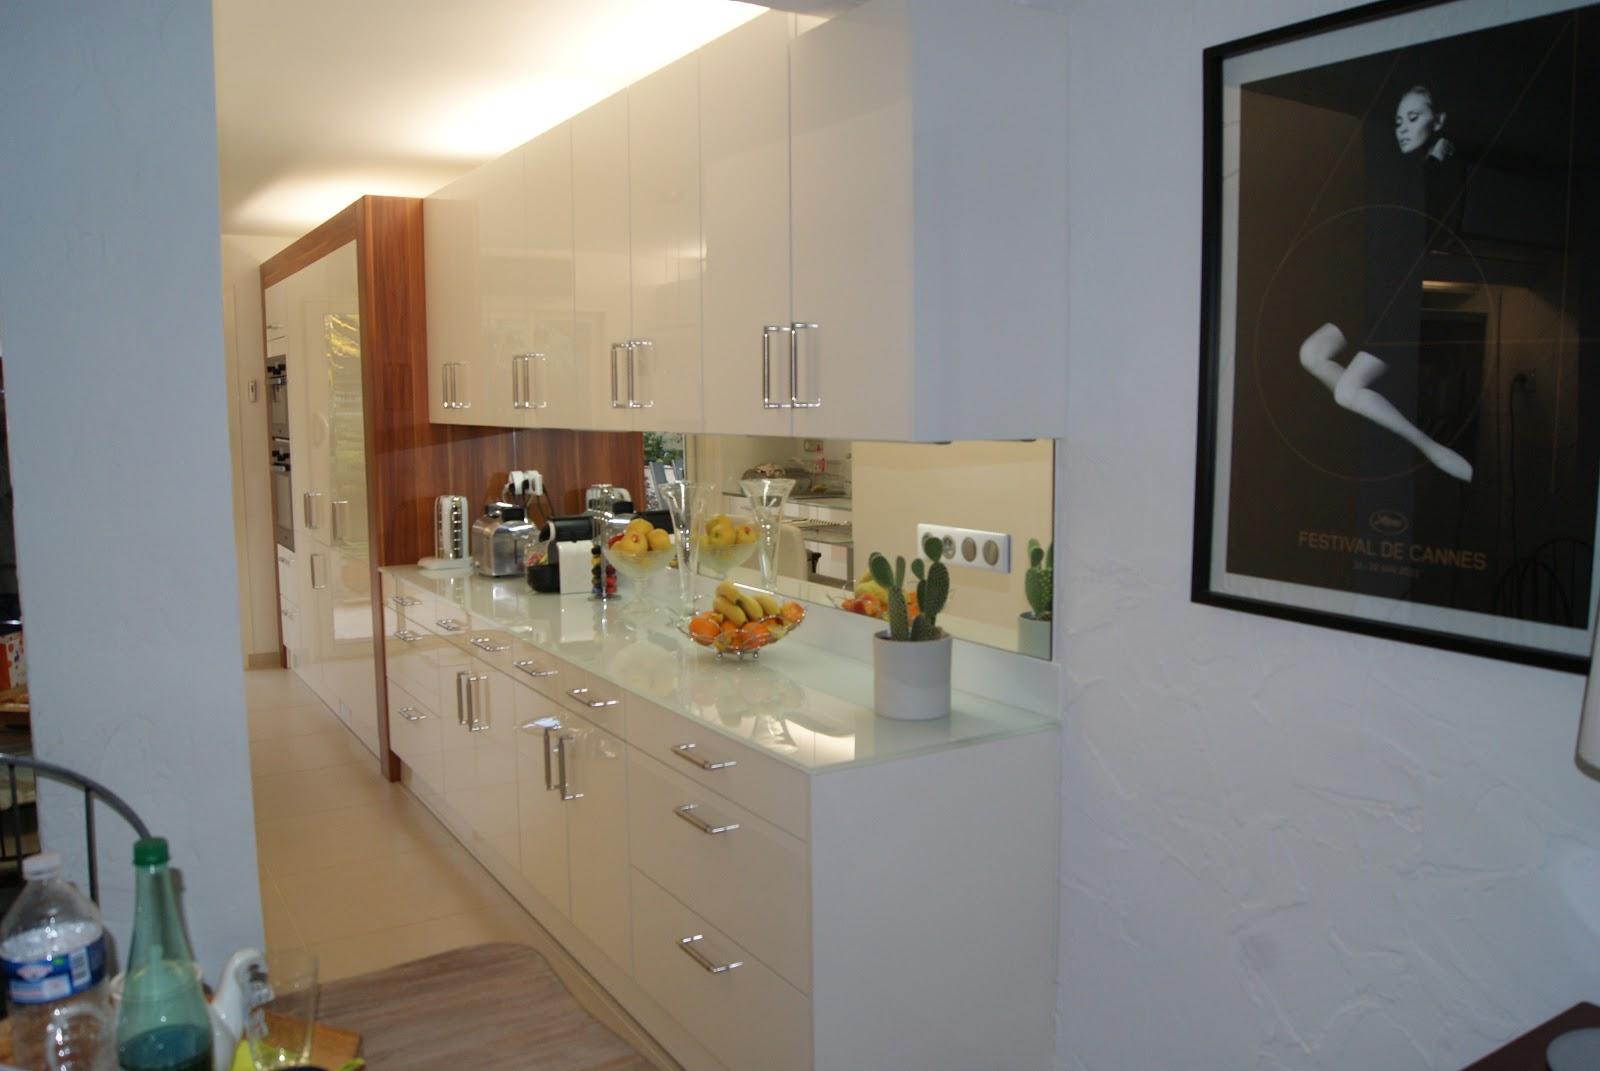 Architecture travaux cabinet donati nouvelle cuisine for Cuisines blanches laquees